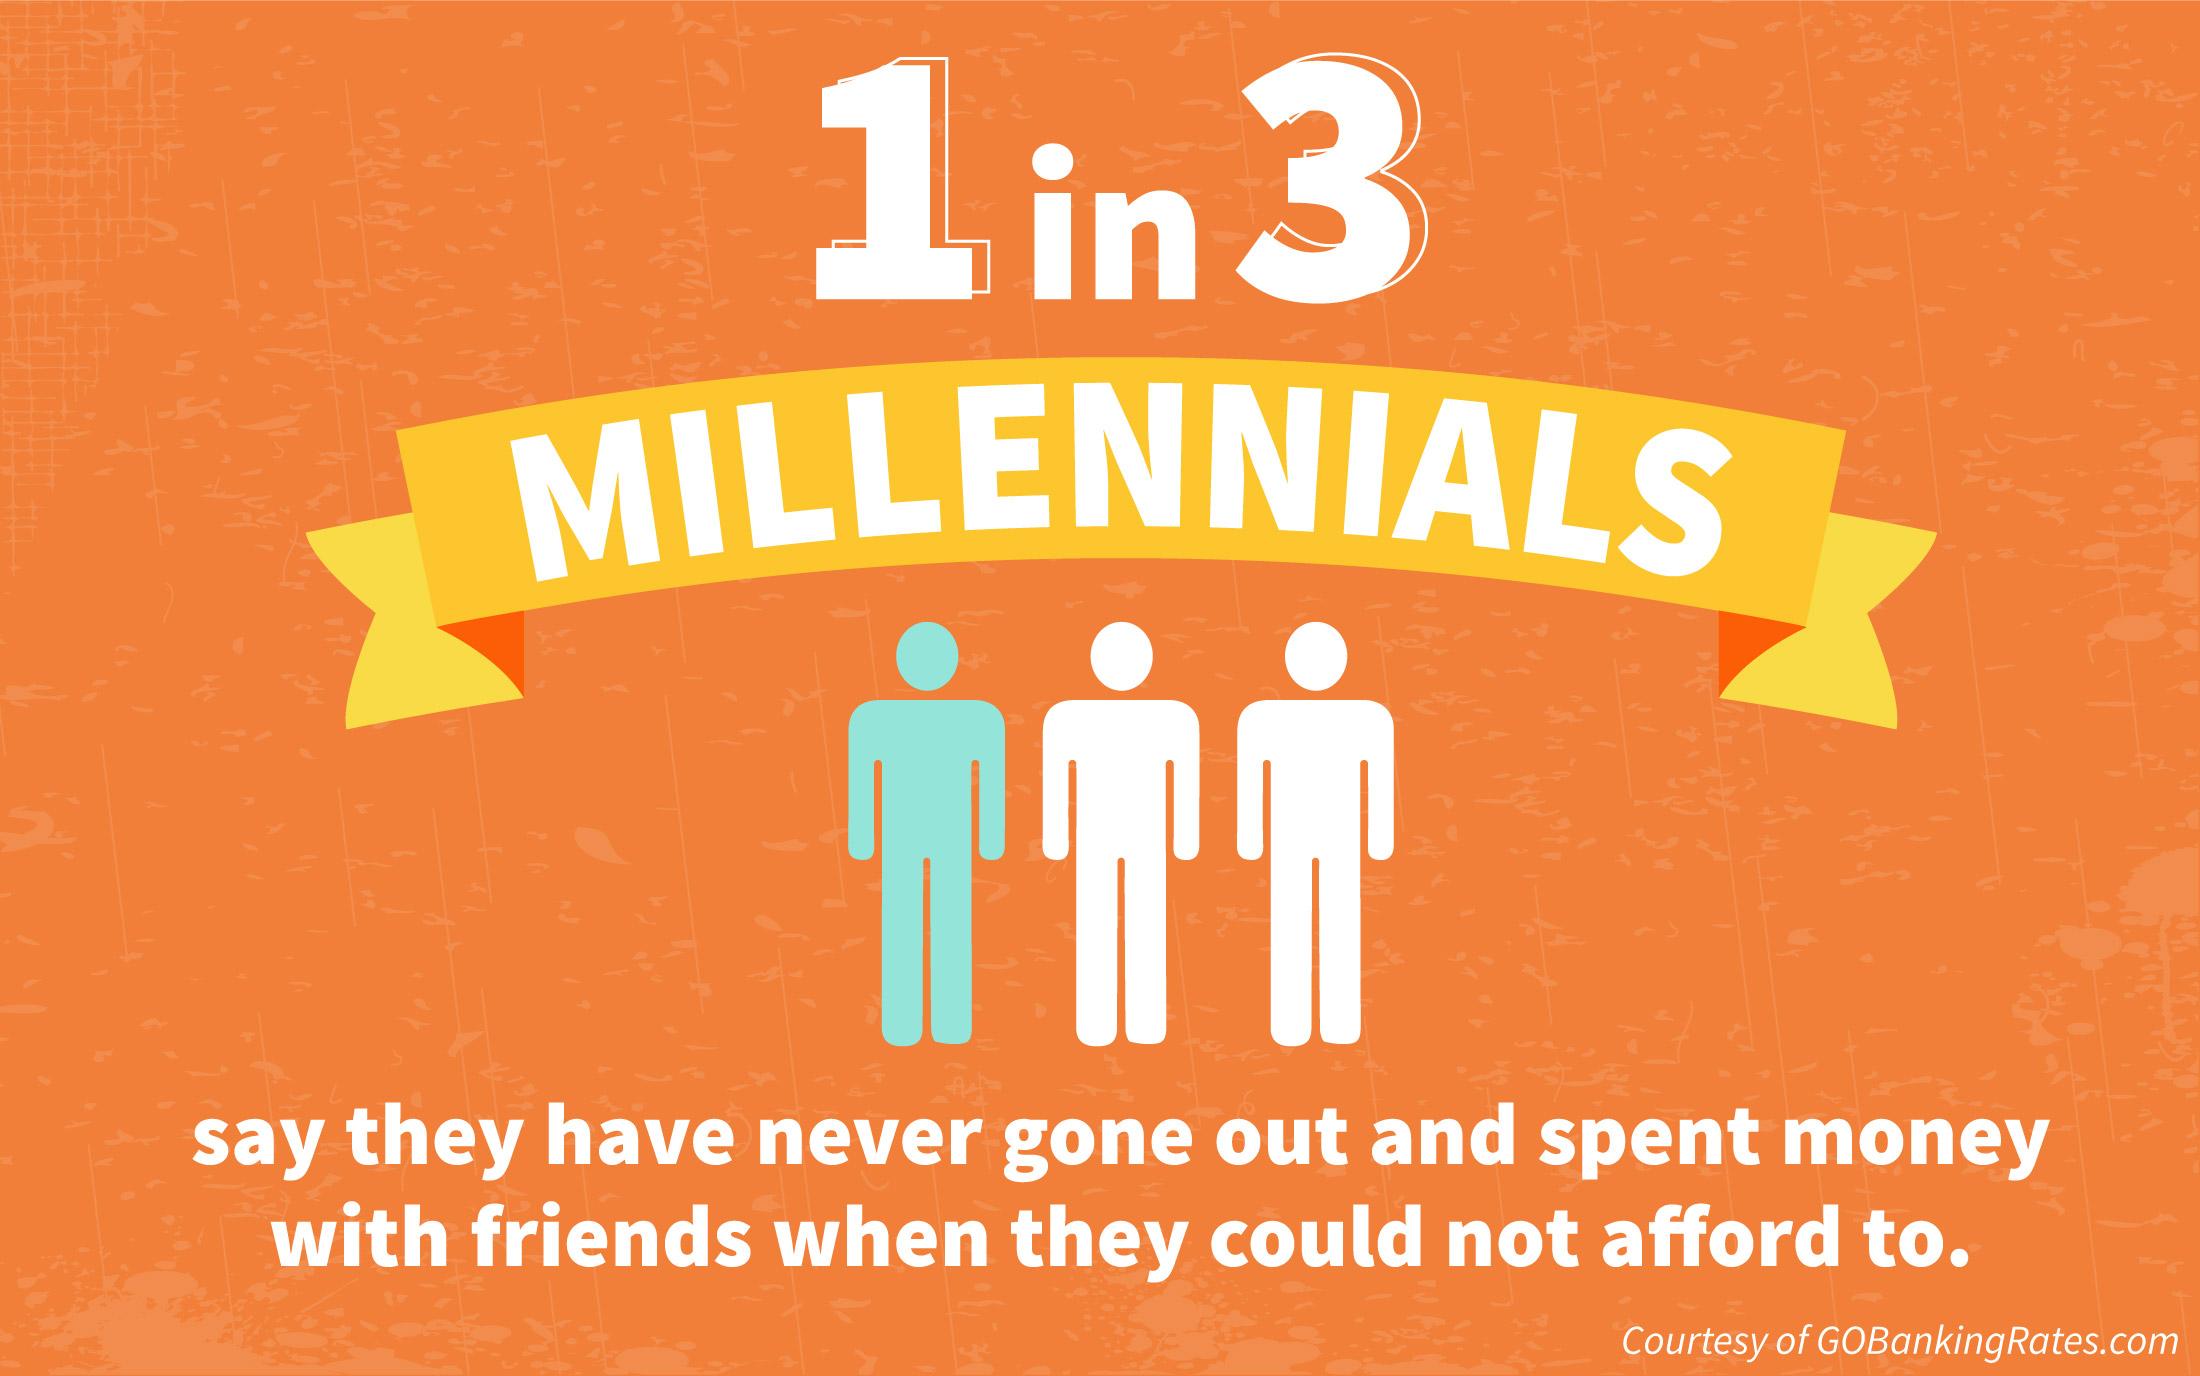 millennials peer pressure